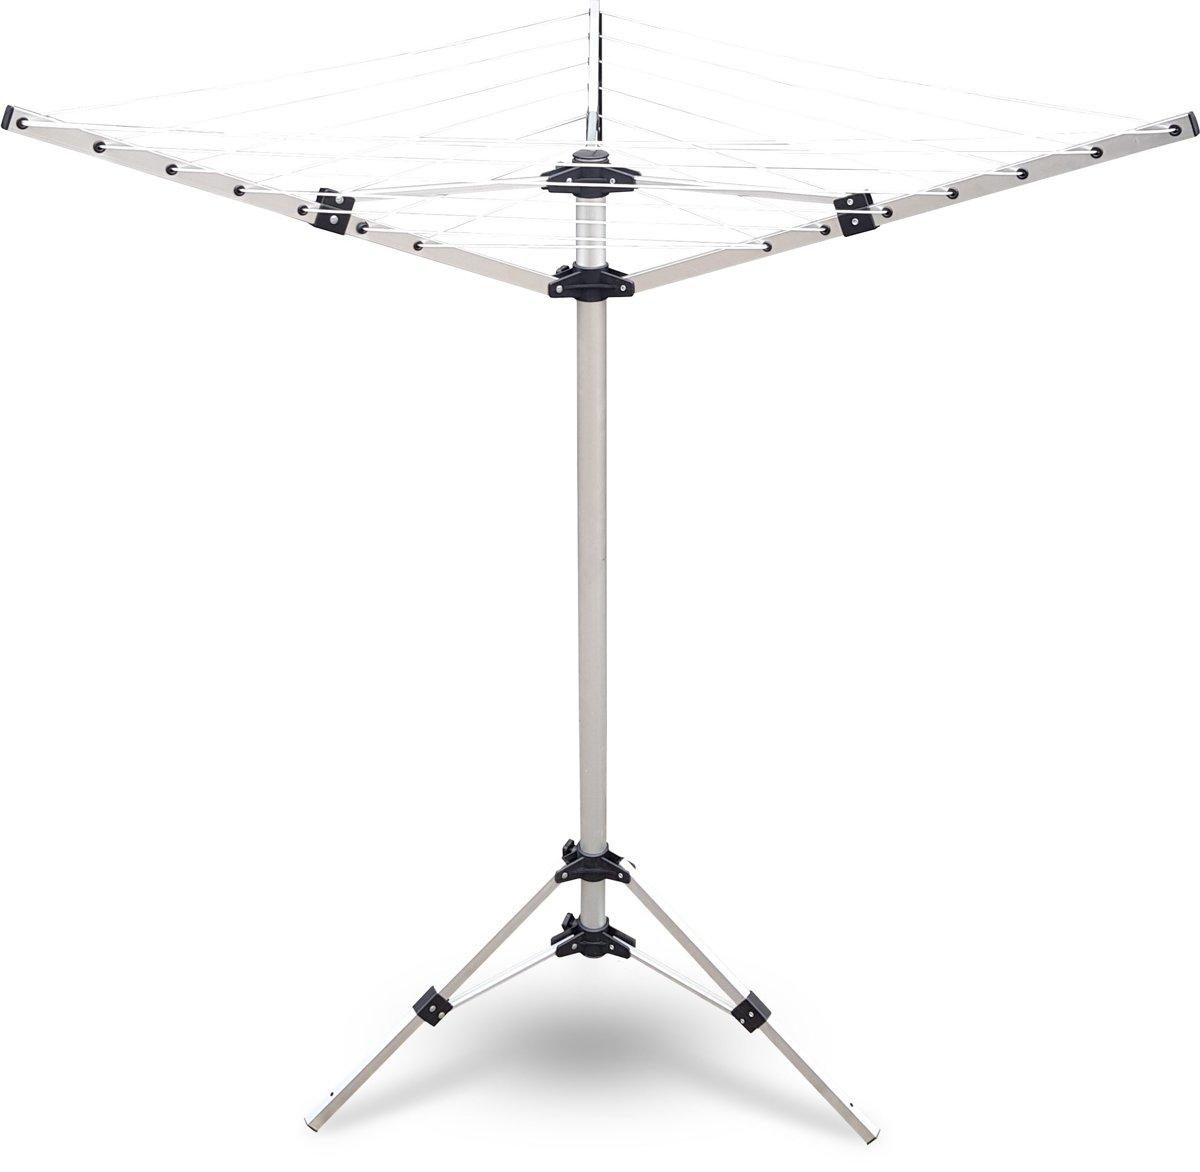 Meisterhome Droogmolen - 18 m lijnlengte - 3 armig - Balkon - Camping kopen